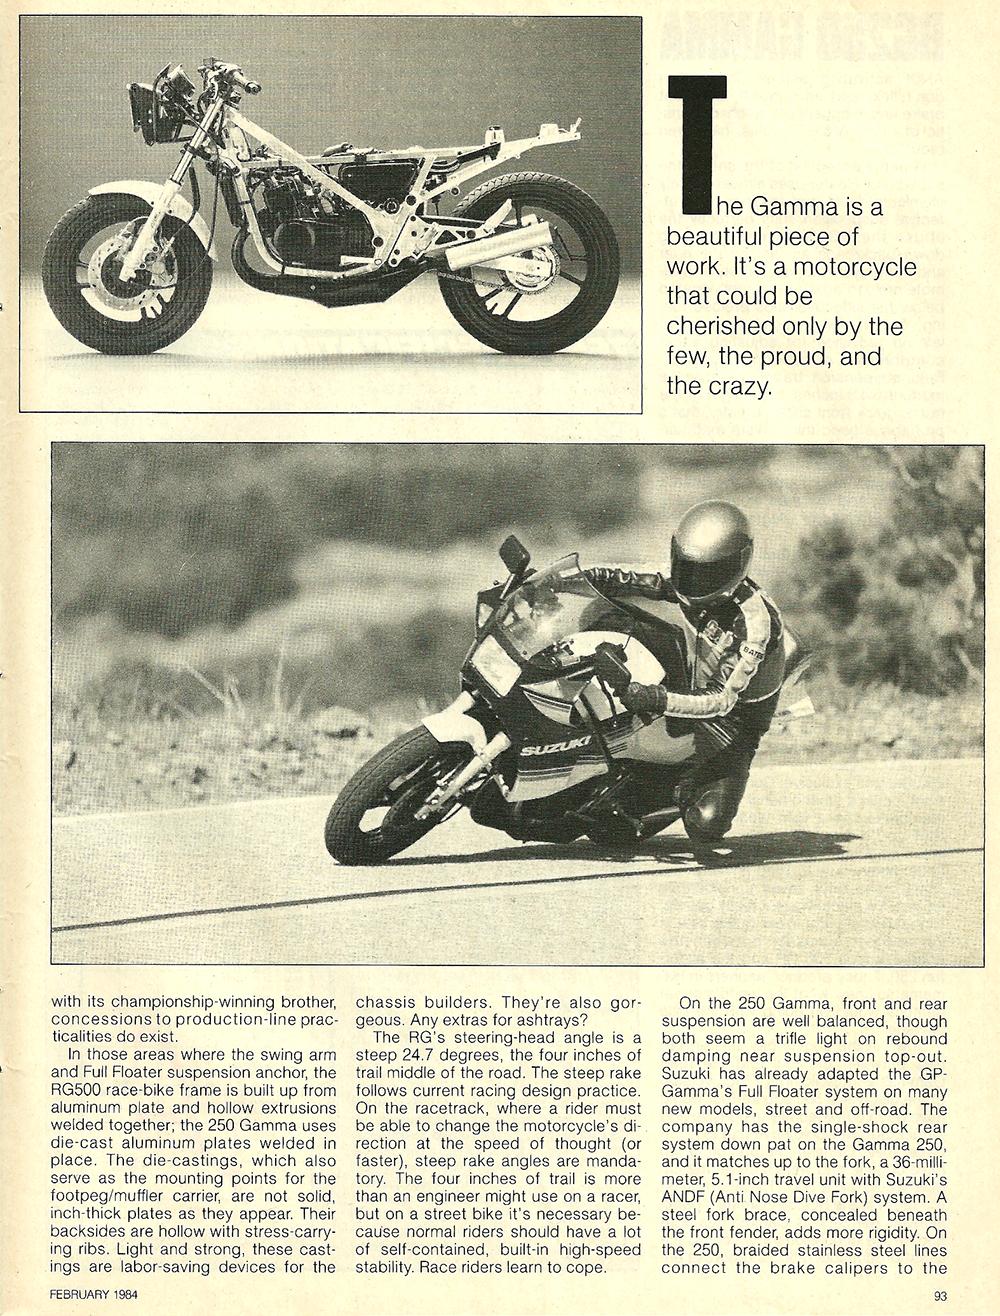 1984 Suzuki RG250 Gamma road test 6.jpg